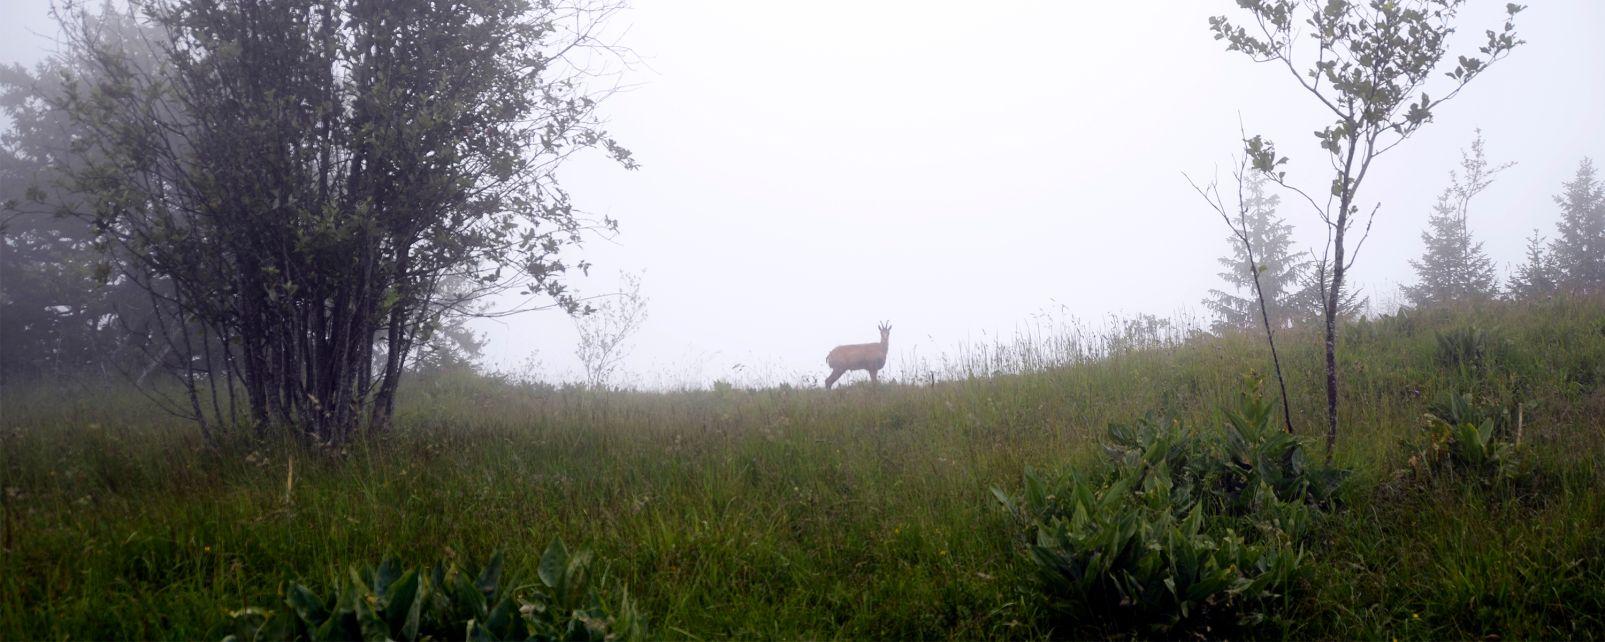 La faune et la flore, chamois, ibex, oscos, espagne, asturies, europe, mammifèer, animal, faune, caprin